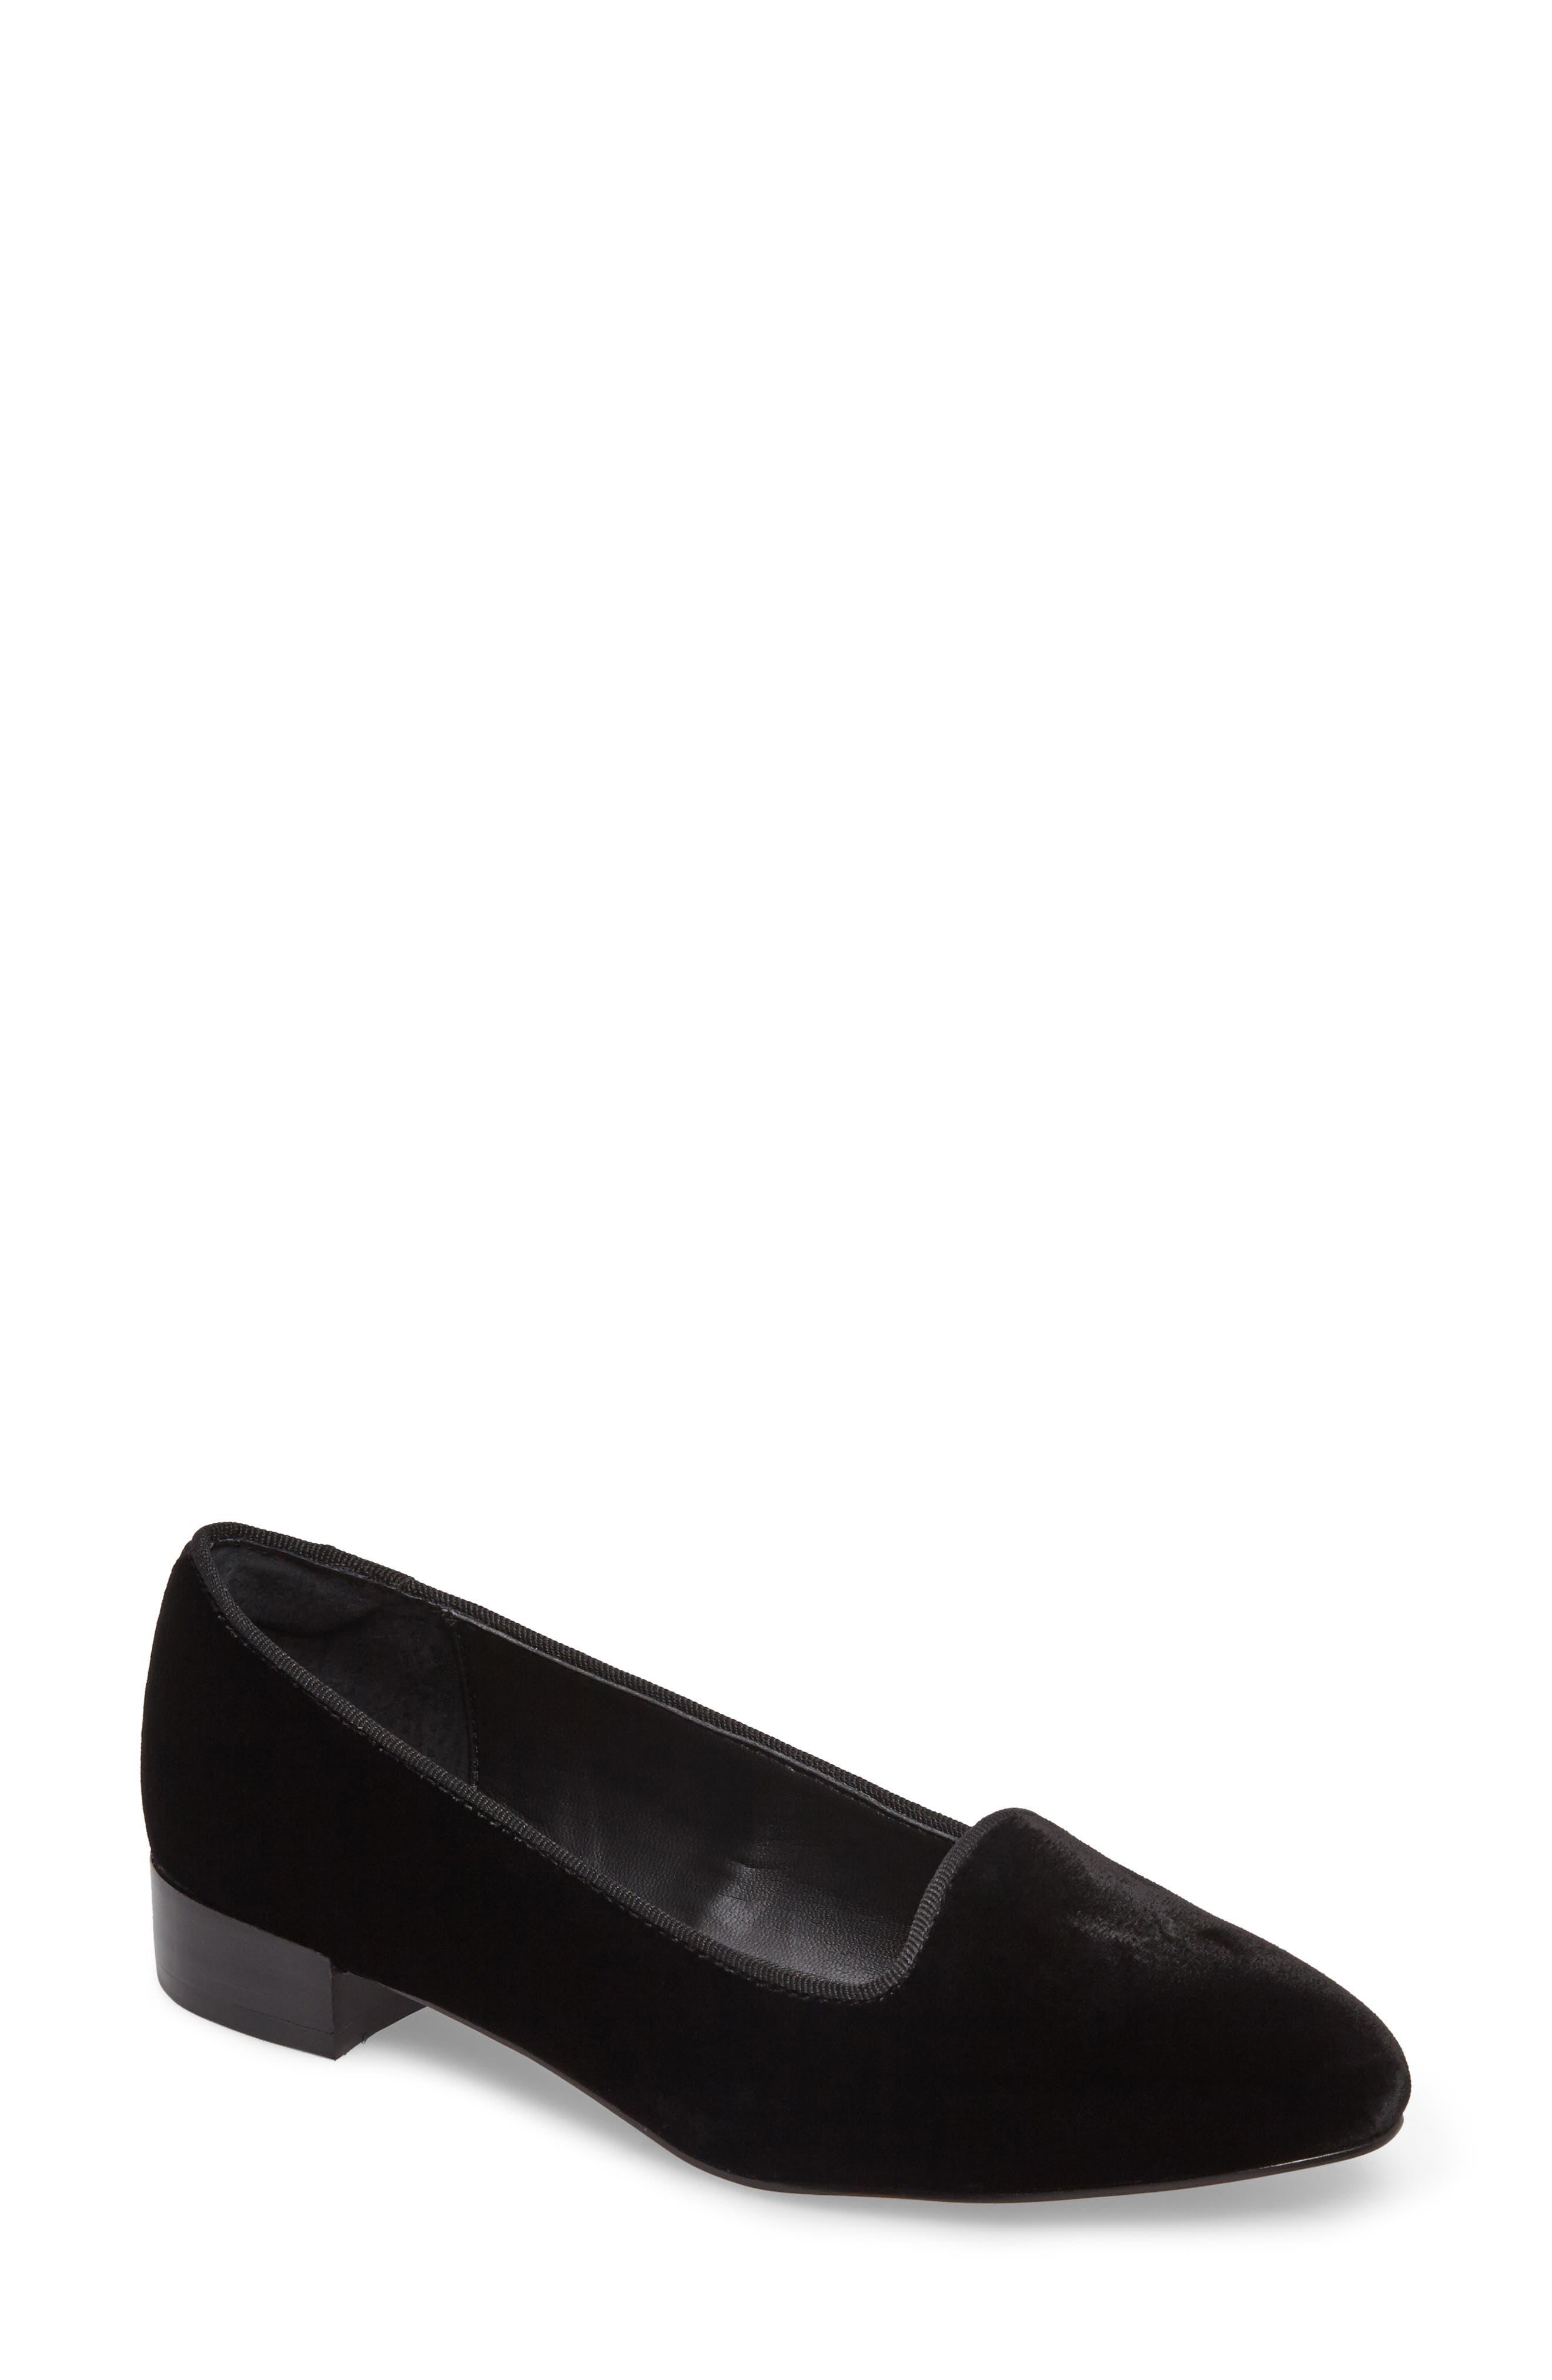 Casoria Smoking Slipper,                         Main,                         color, BLACK VELVET